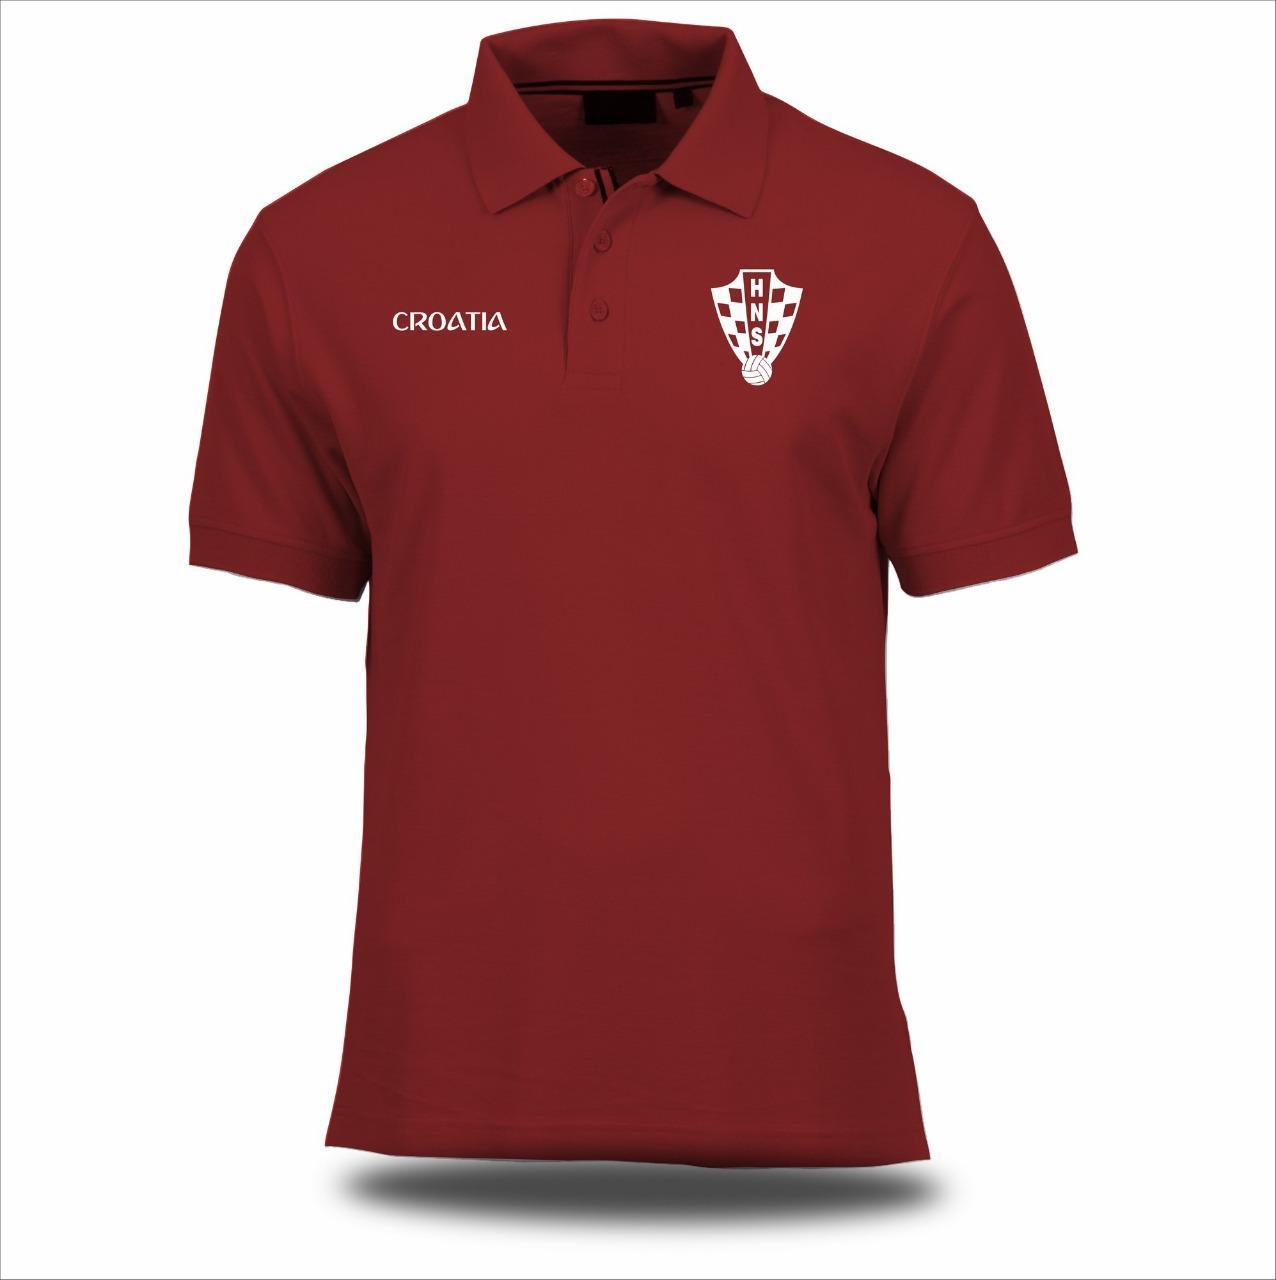 Polo Shirt World Cup Kroasia 2018 Russia Rusia Jersey Ori Kaos Kerah Bahan Lacoste Premium